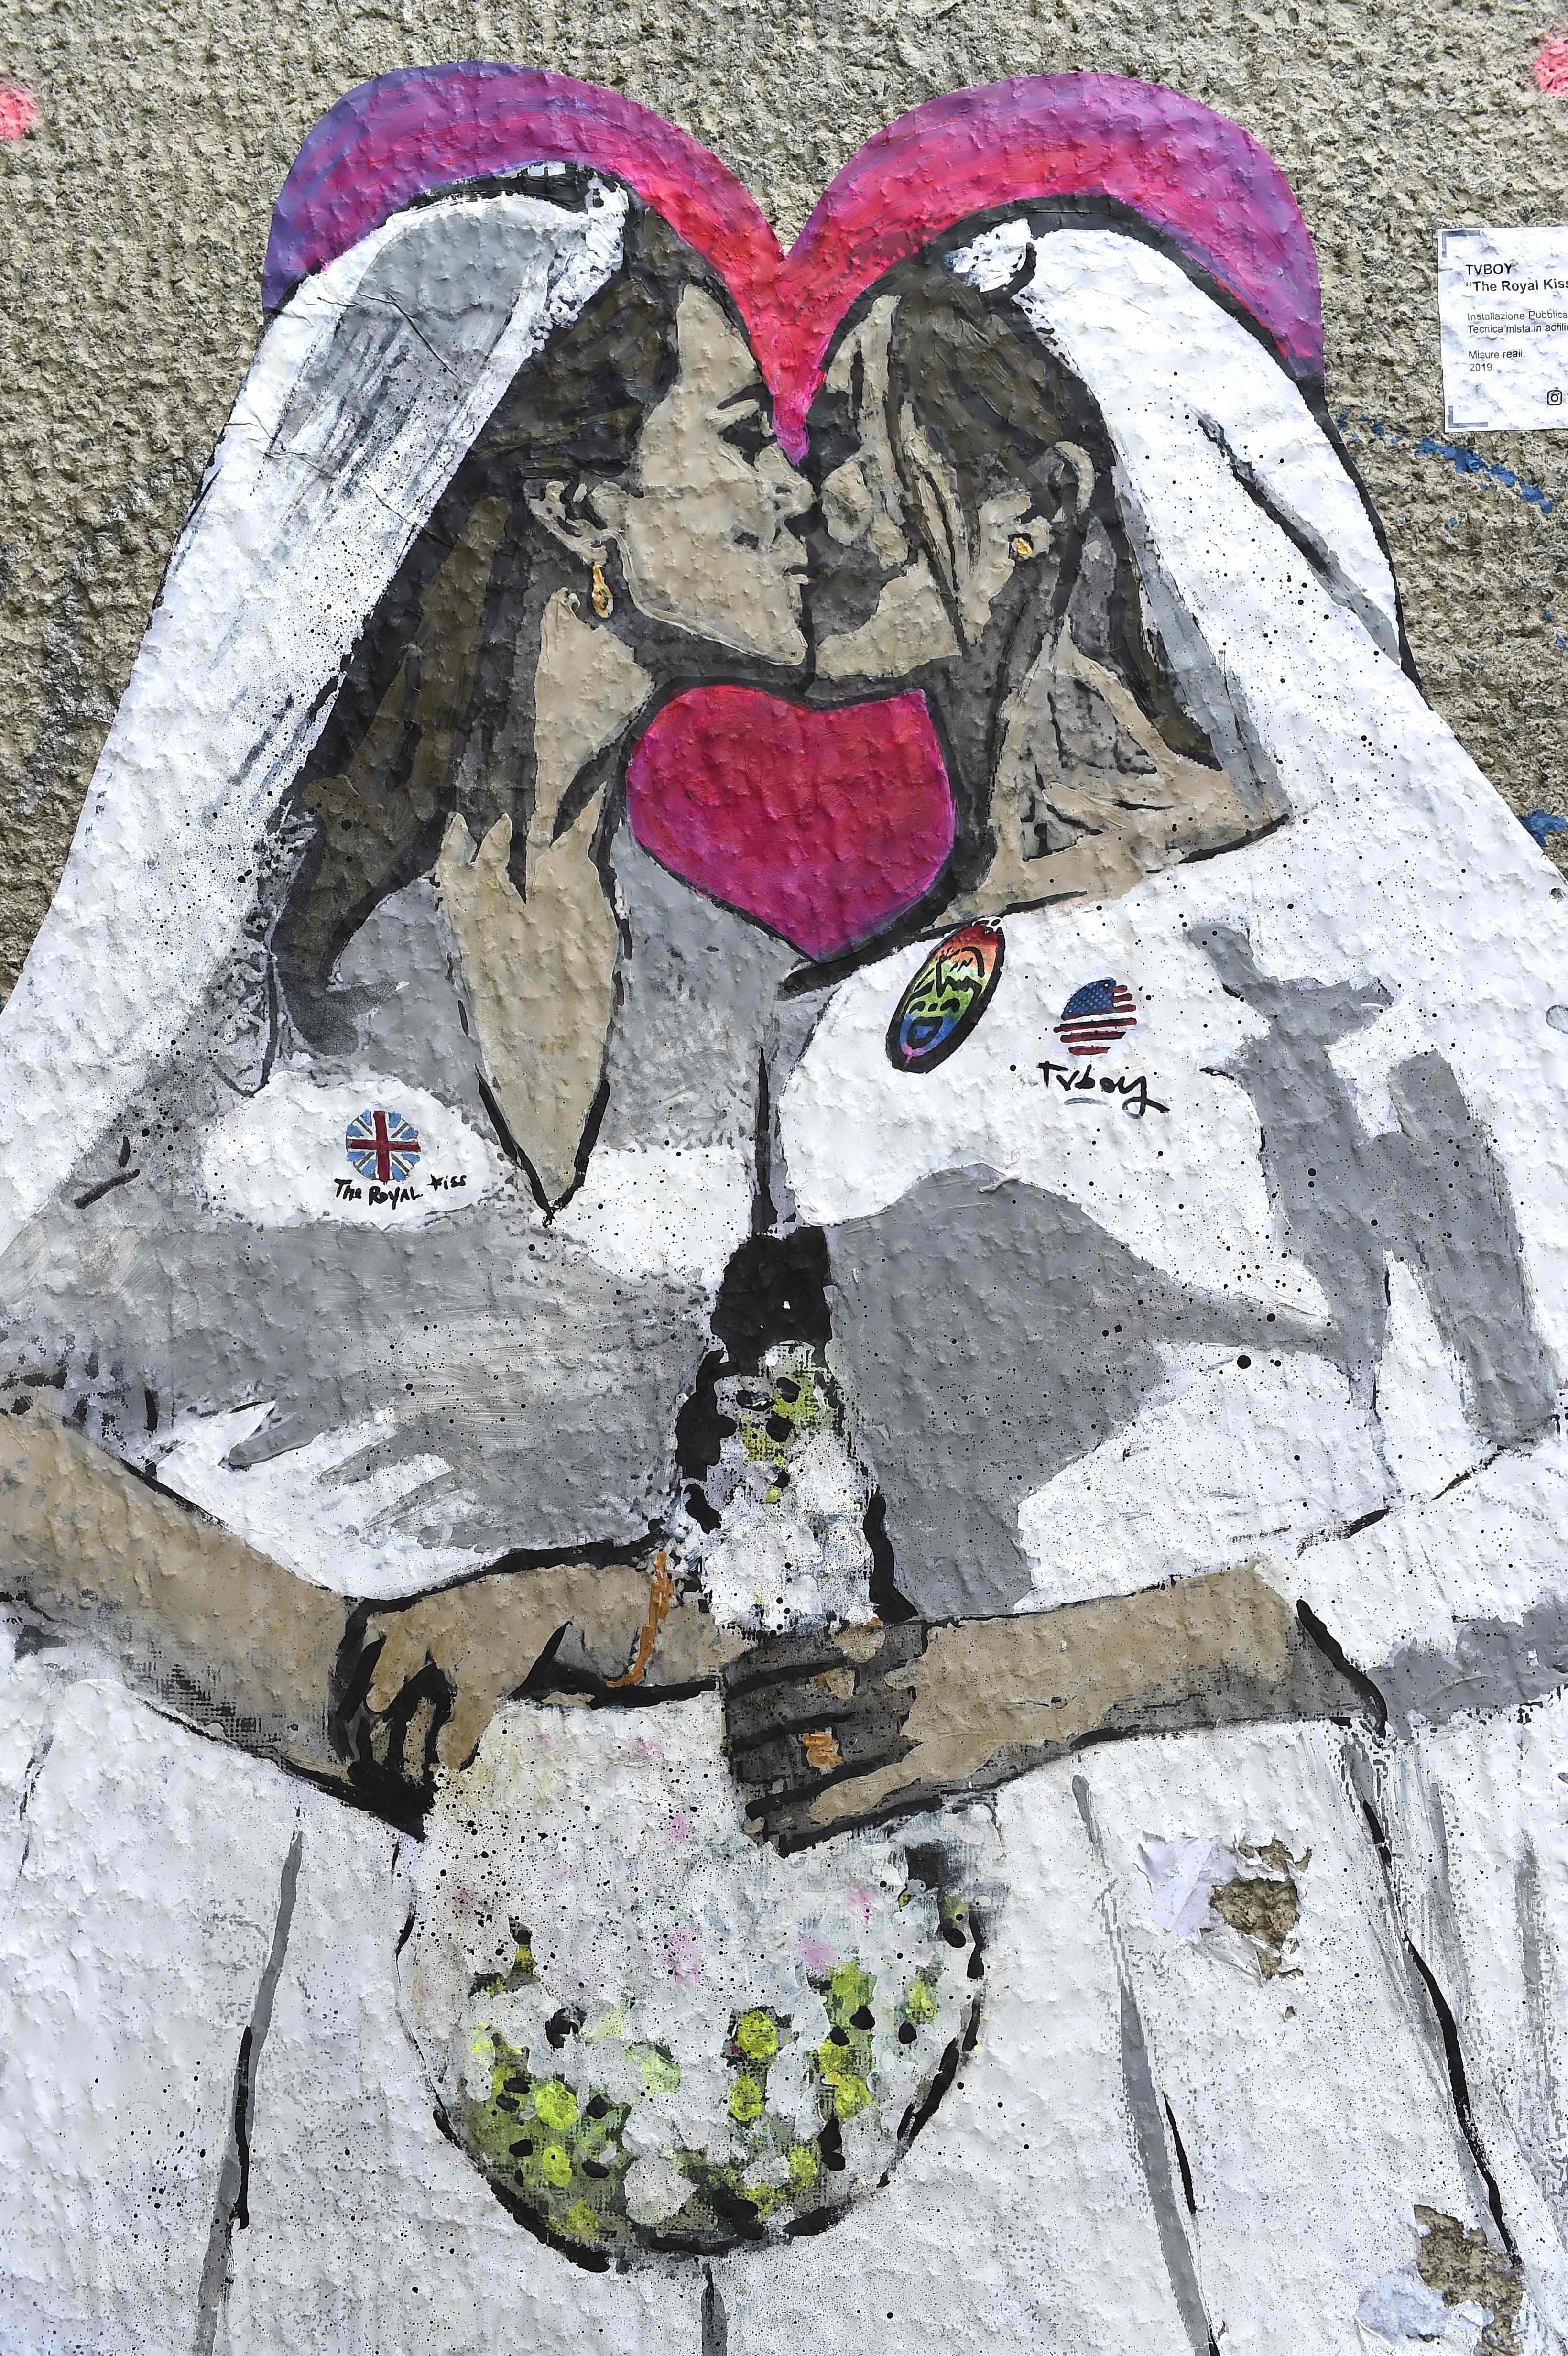 В Милане появился мурал с целующимися Кейт Миддлтон и Меган Маркл